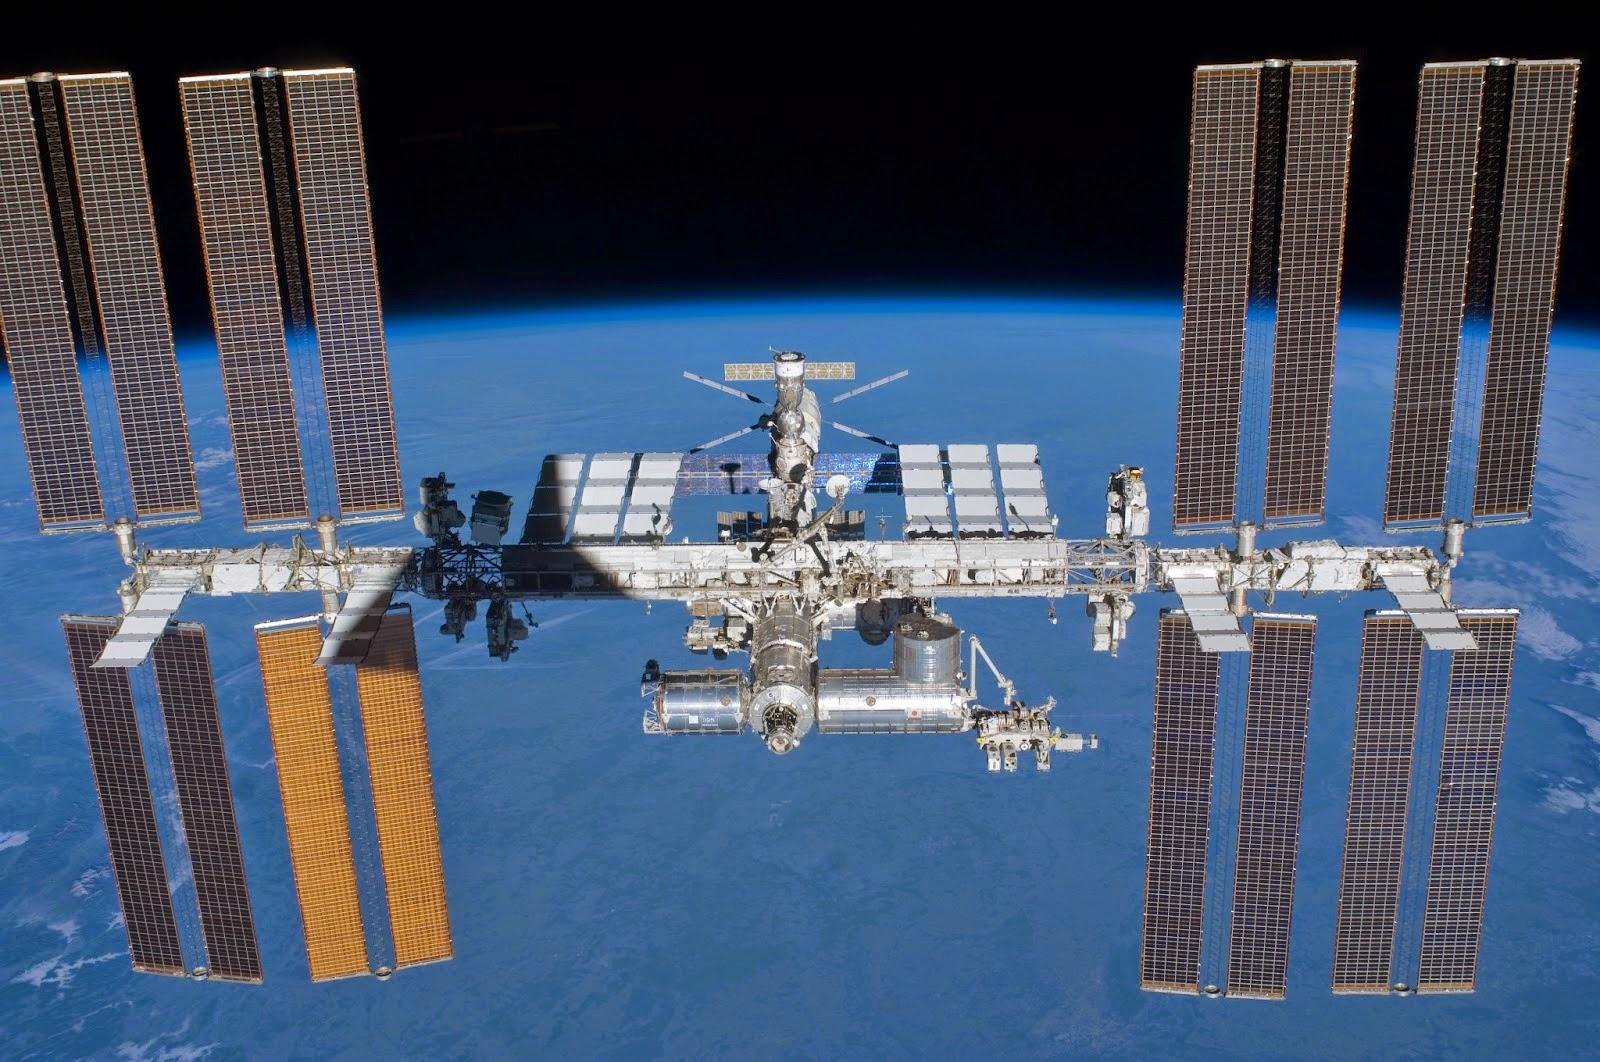 nasa international space station information - photo #3